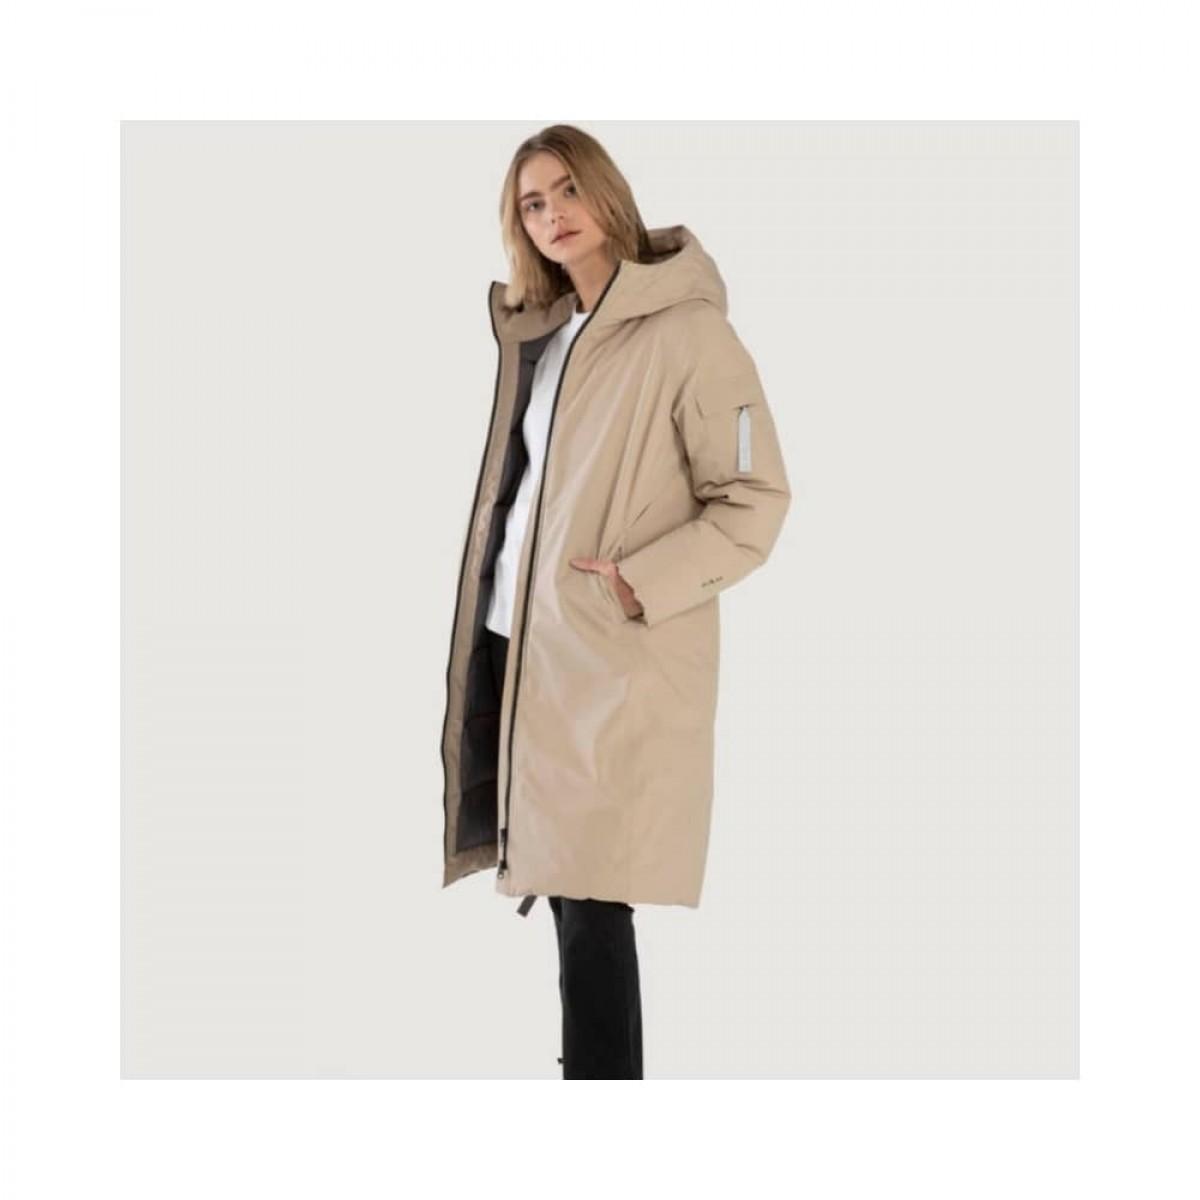 bjorli jacket - beige - model fra siden